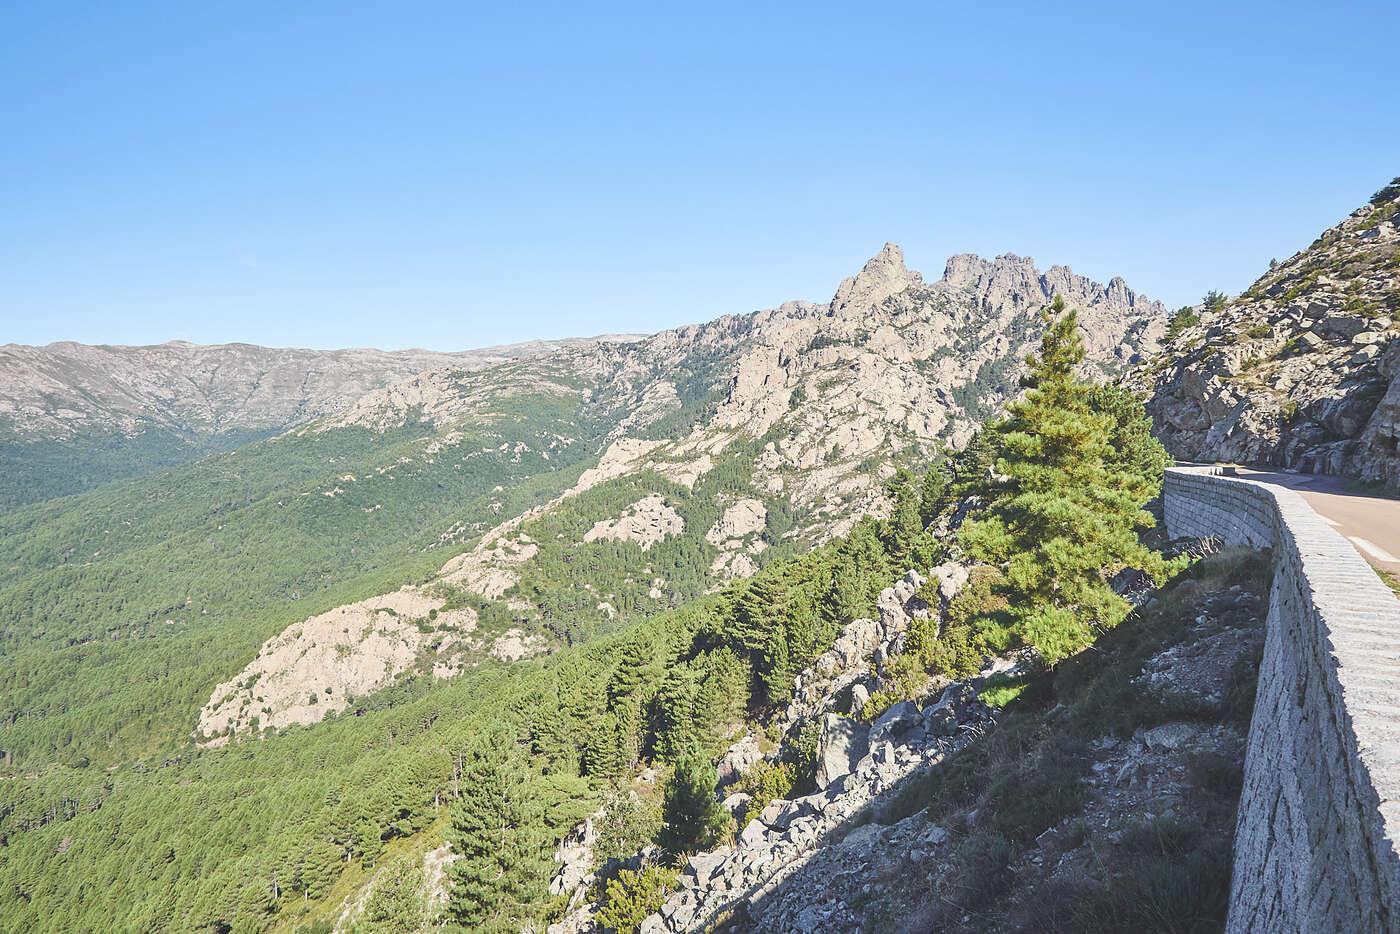 Montagnes de l'Alta-Rocca